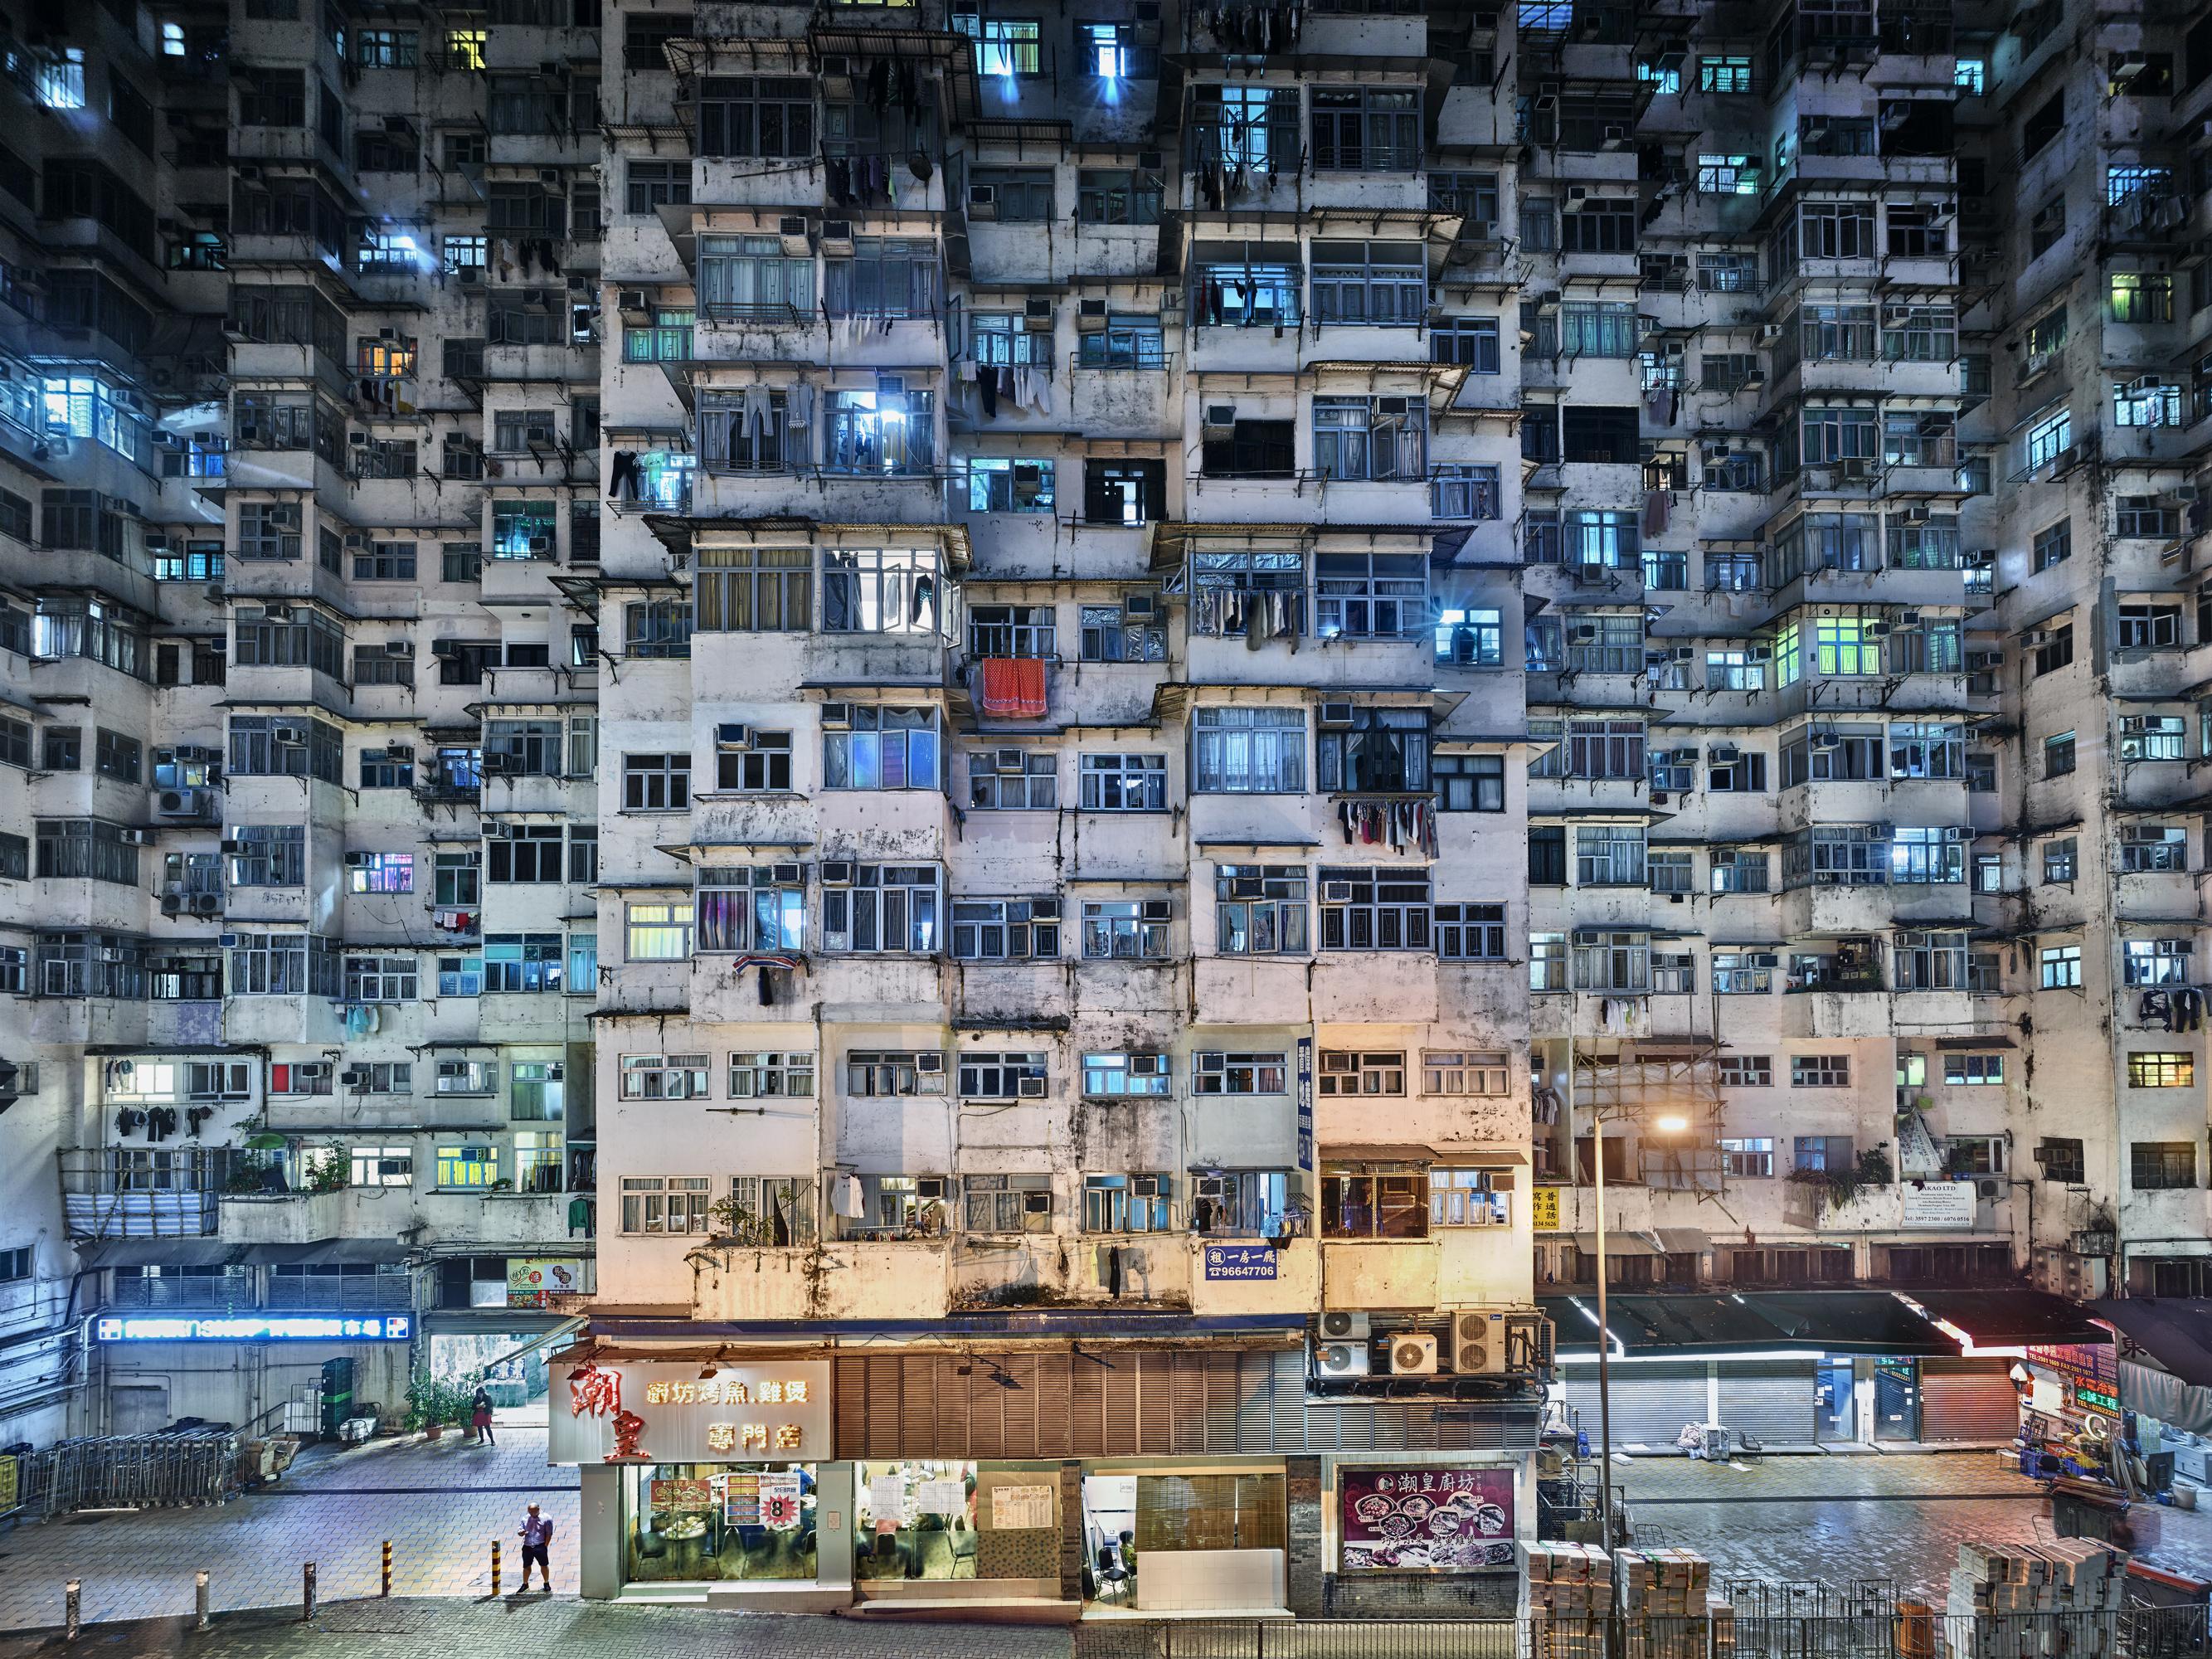 Luca Campigotto, Honk Kong, 2016,  stampa a pigmenti naturali su dibond © Luca Campigotto